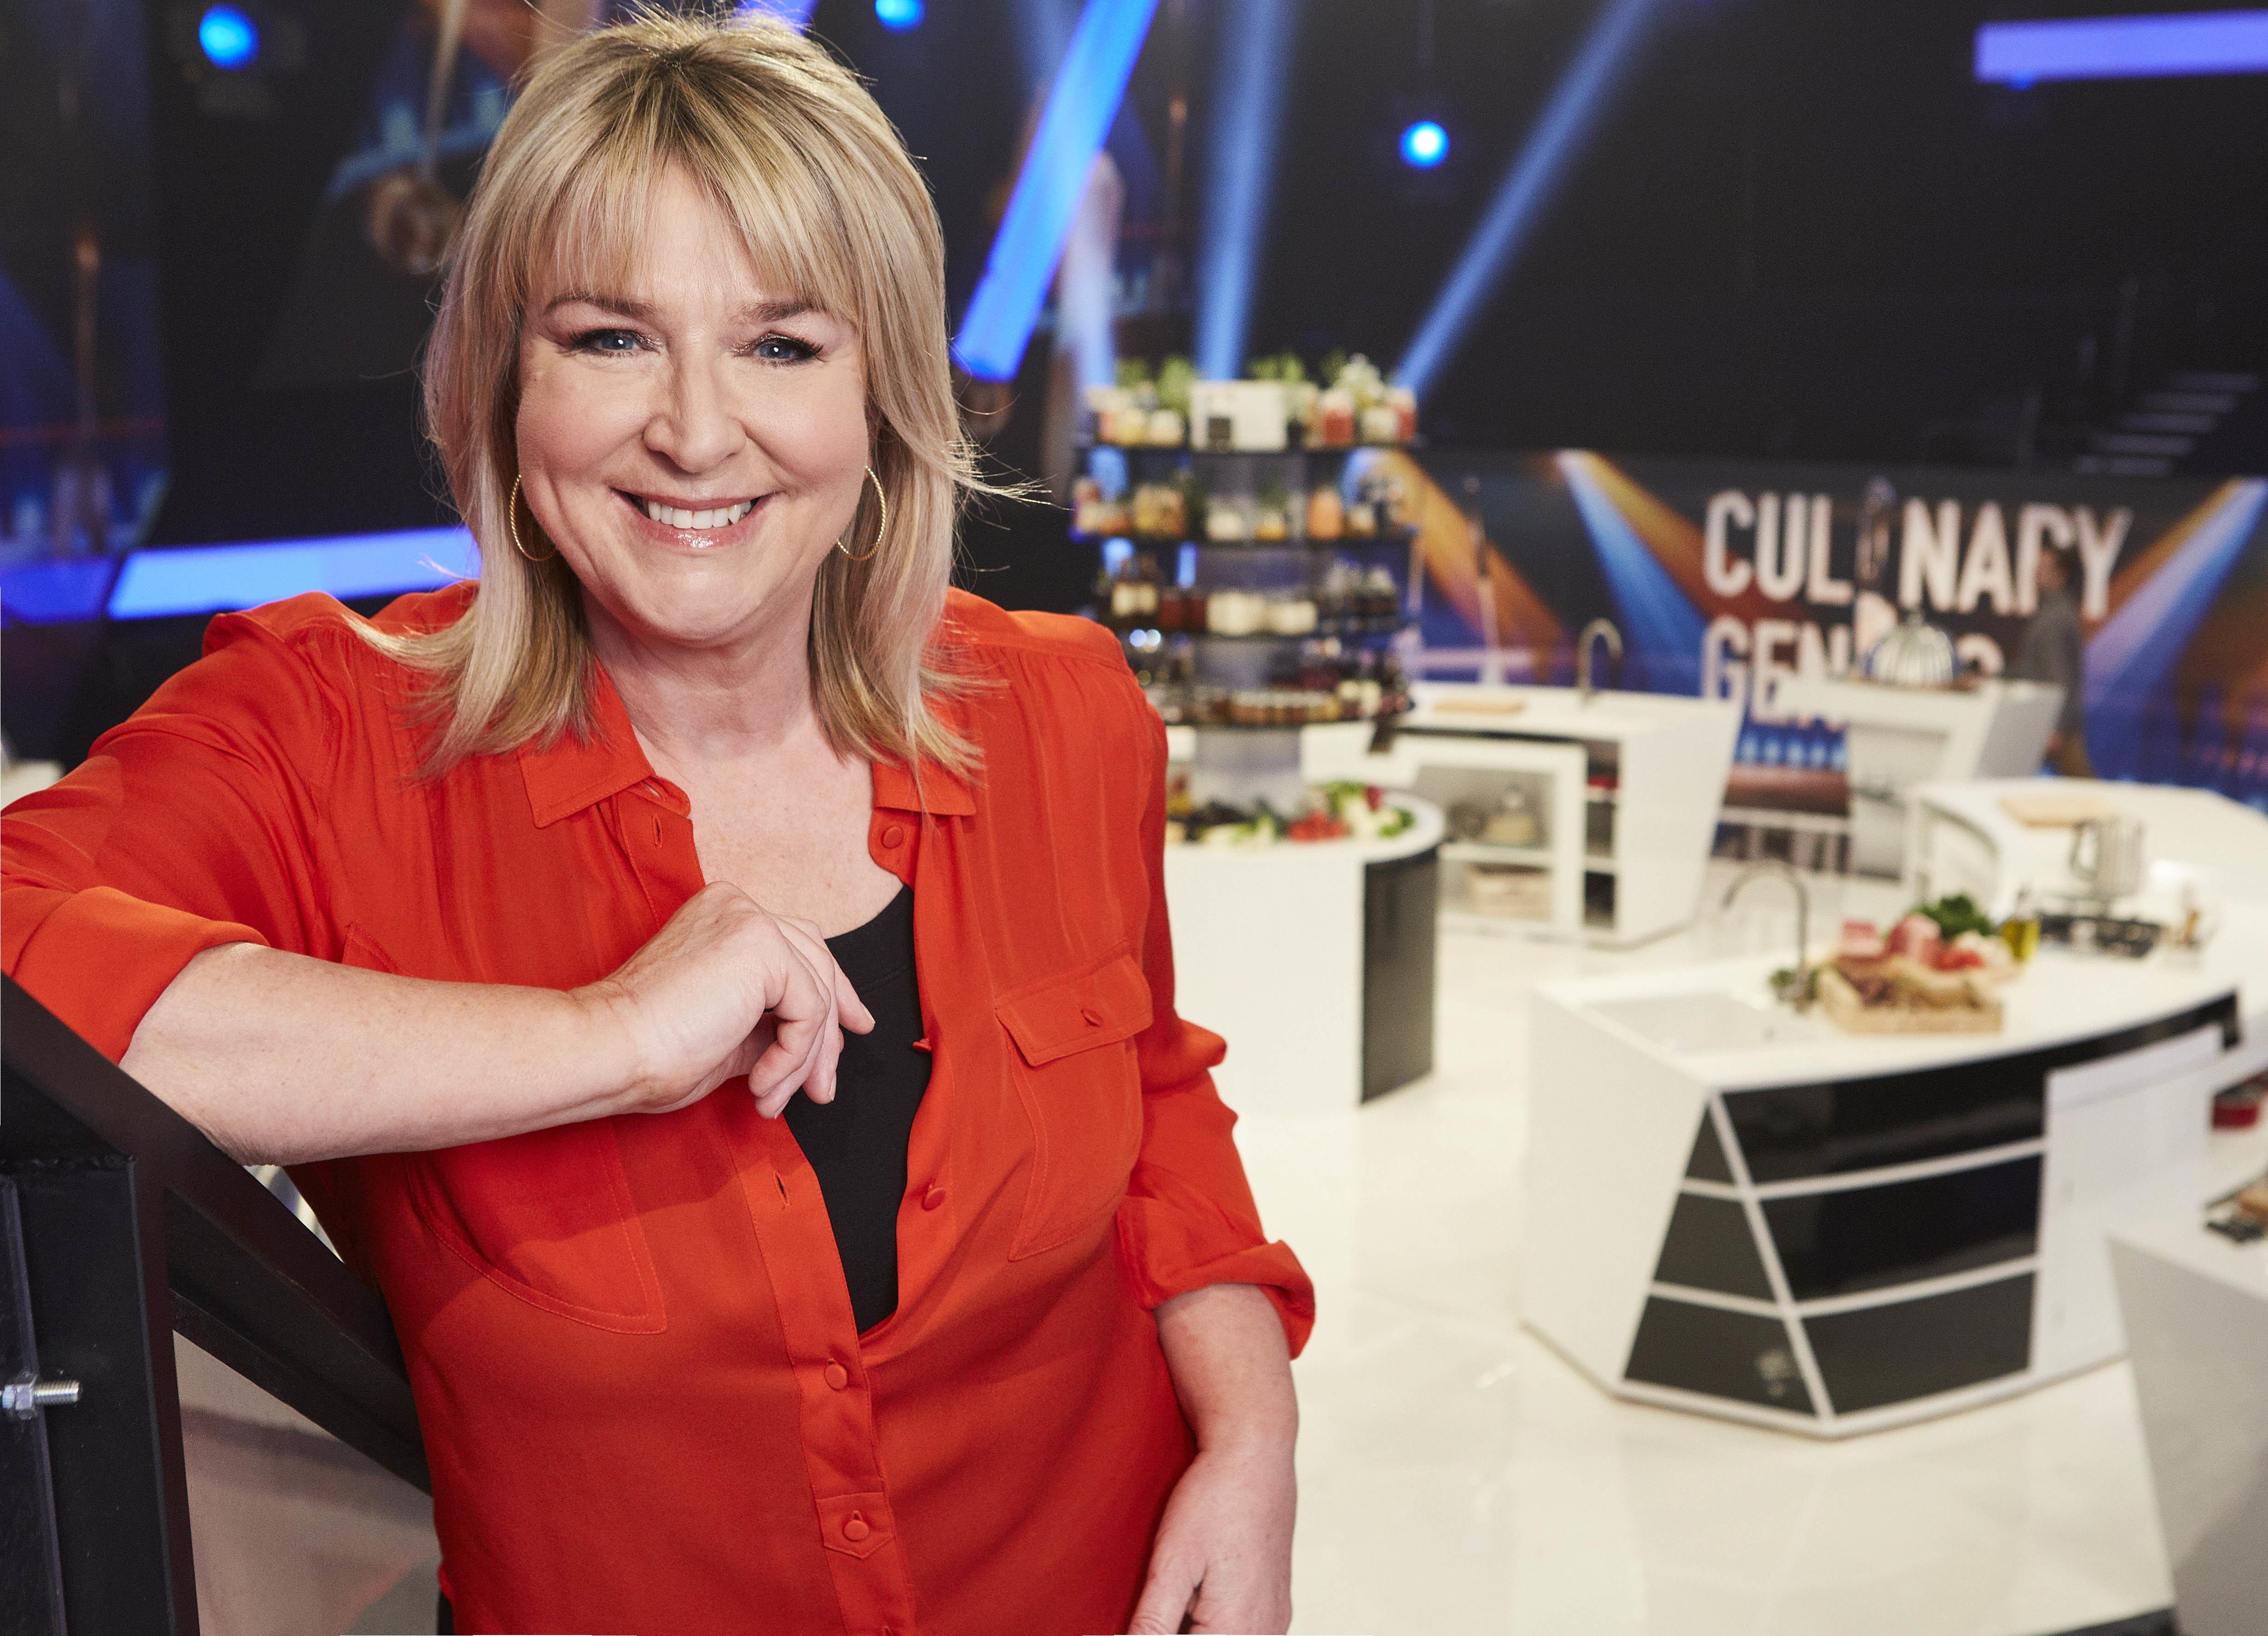 Fern Britton Reveals All On Gordon Ramsay's Brutal New Show 'Culinary